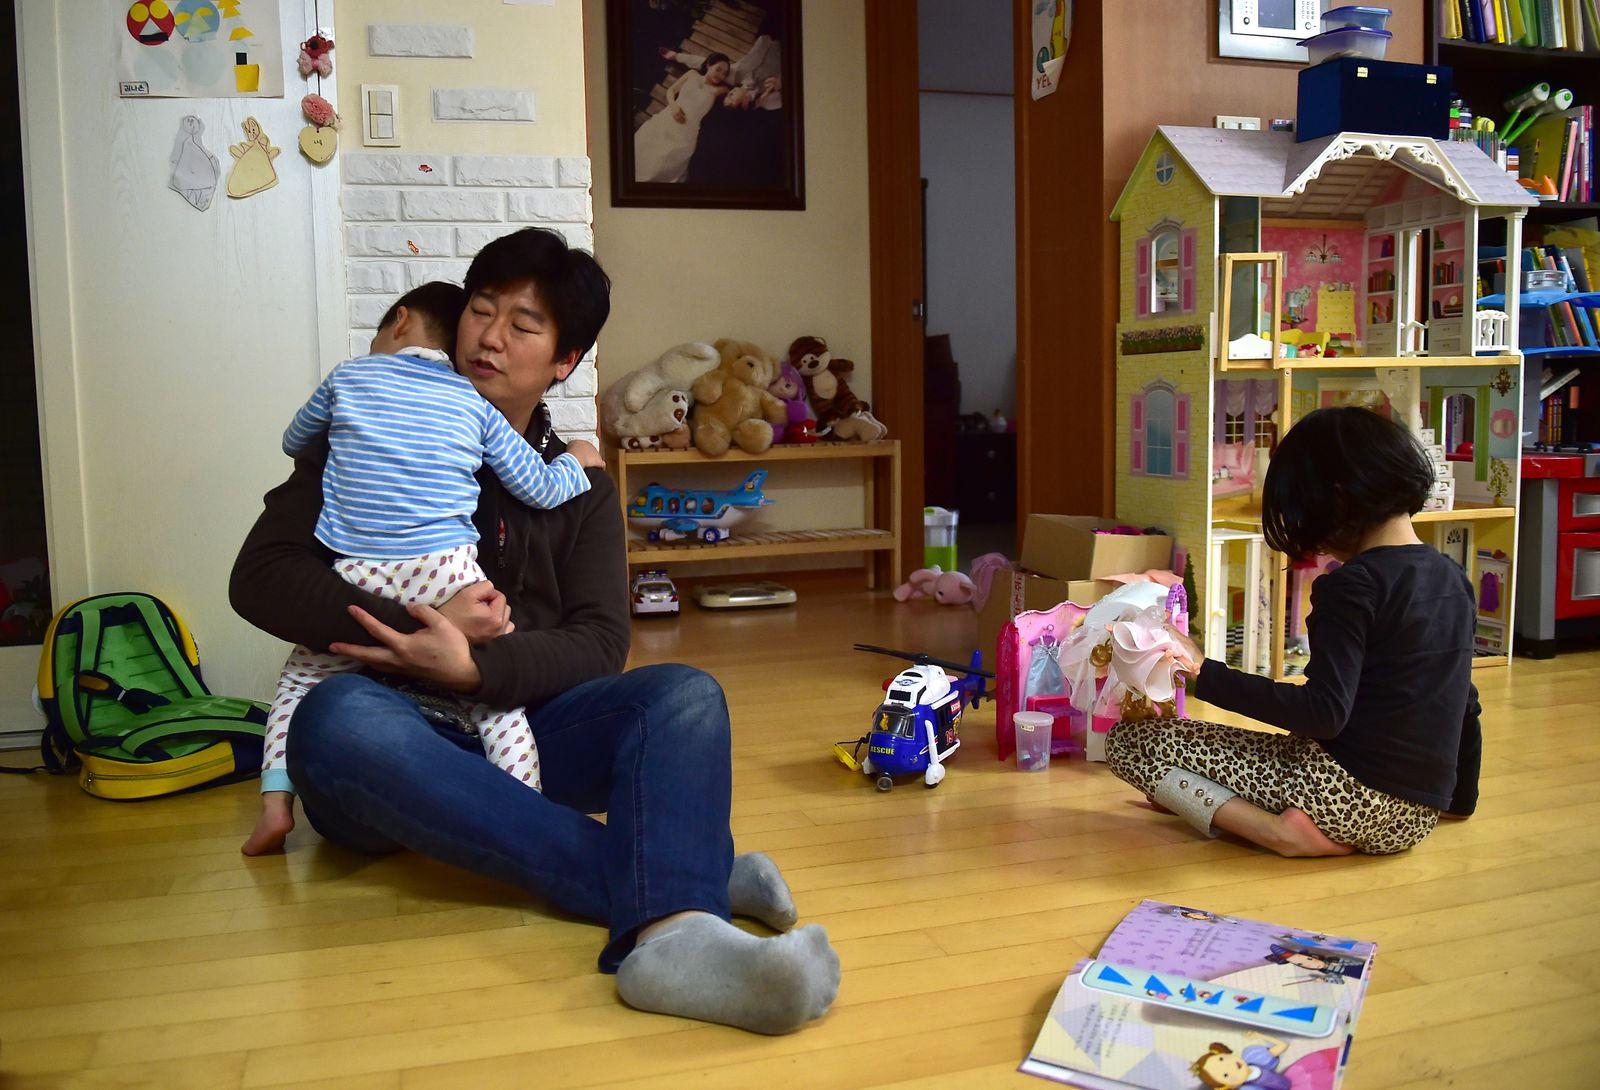 DOUNIAMAG-SKOREA-POPULATION-BIRTH-FAMILY-GENDER